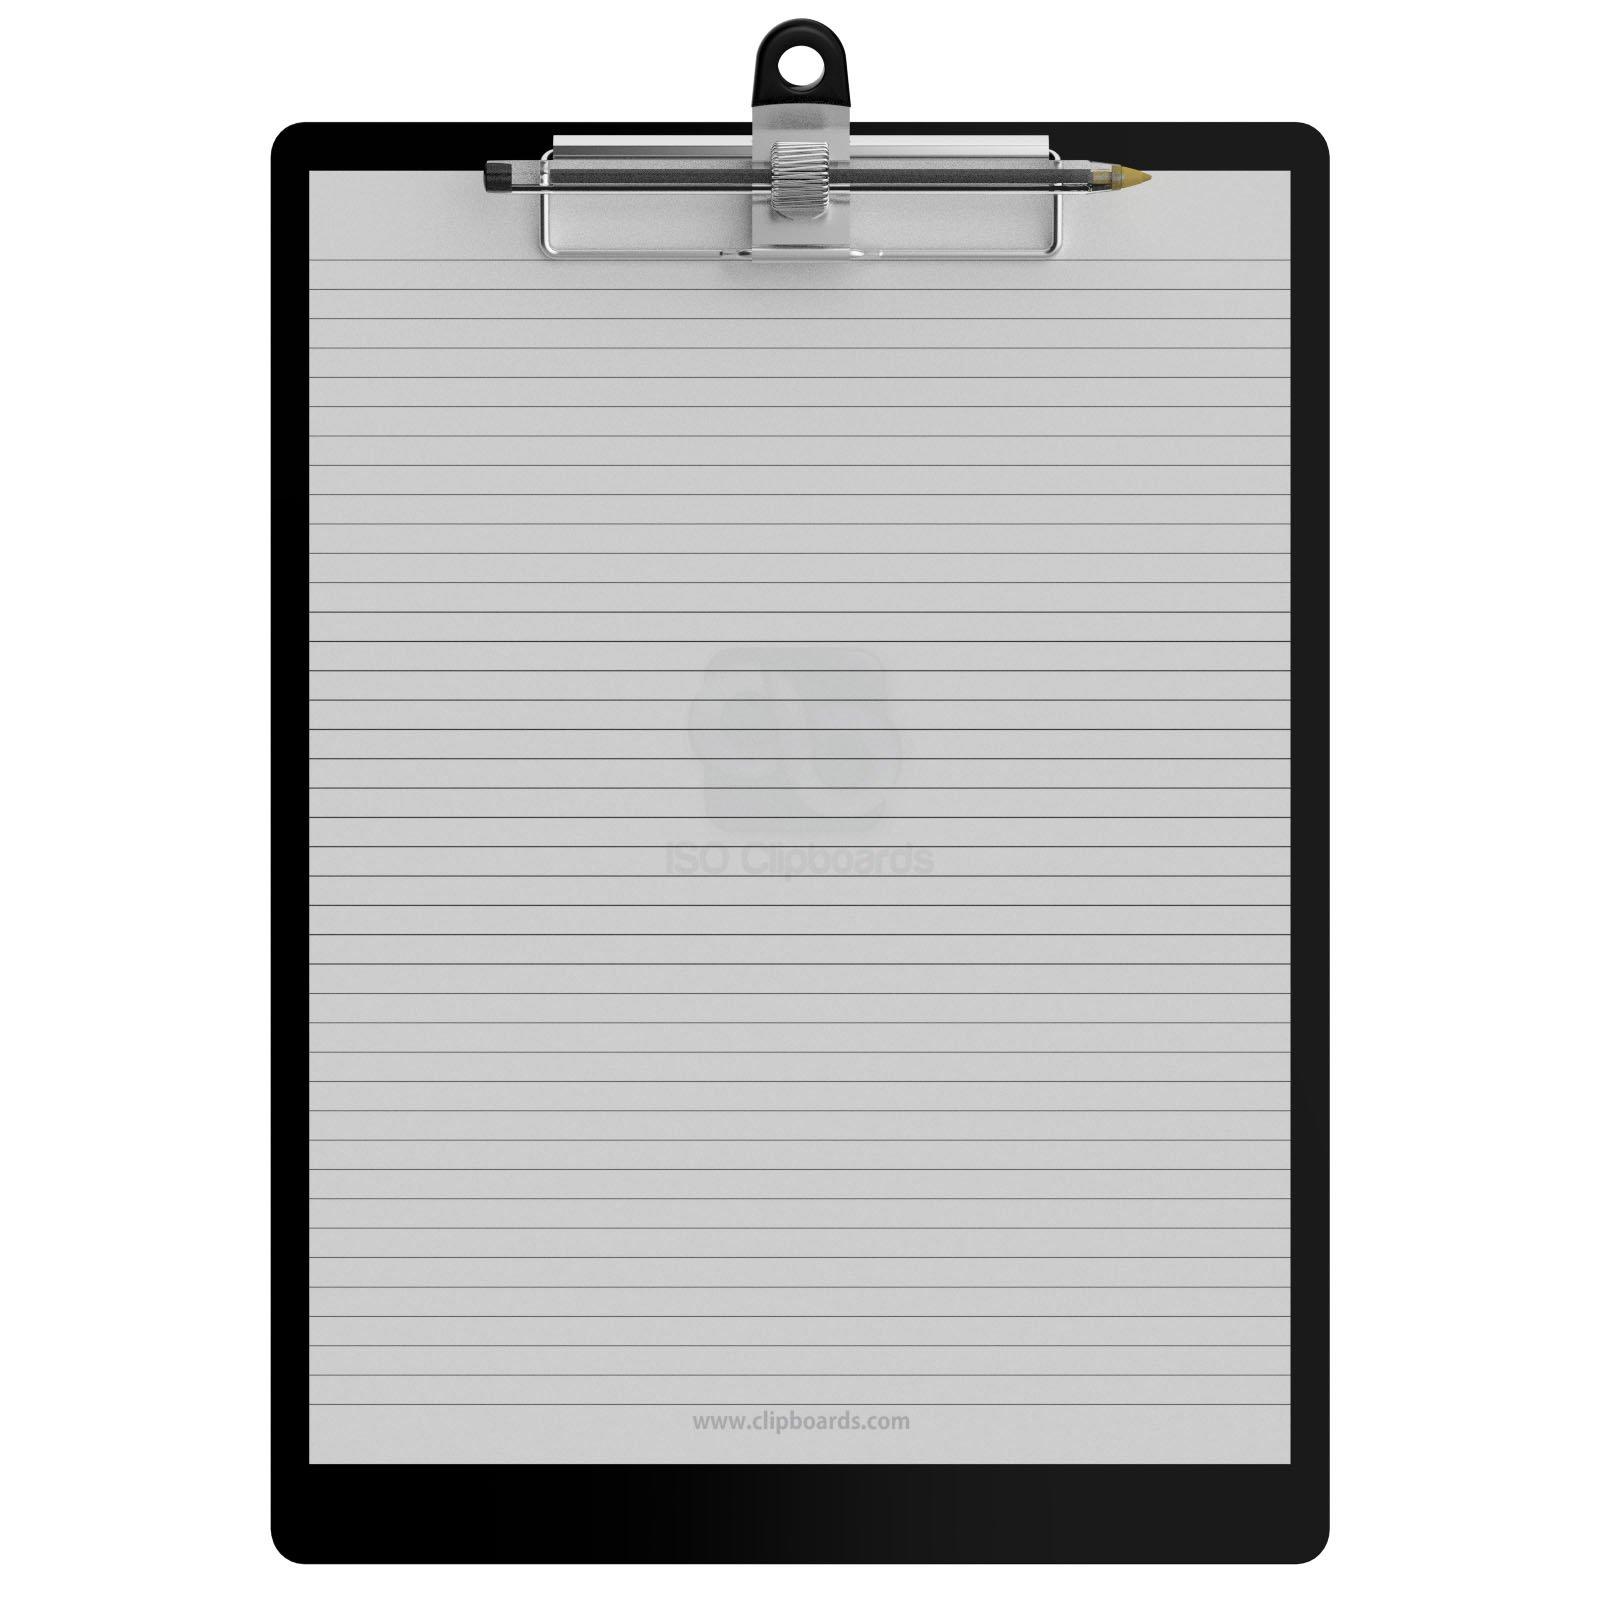 Pen Holder Letter Size 8.5 x 11 Aluminum Clipboard - Black